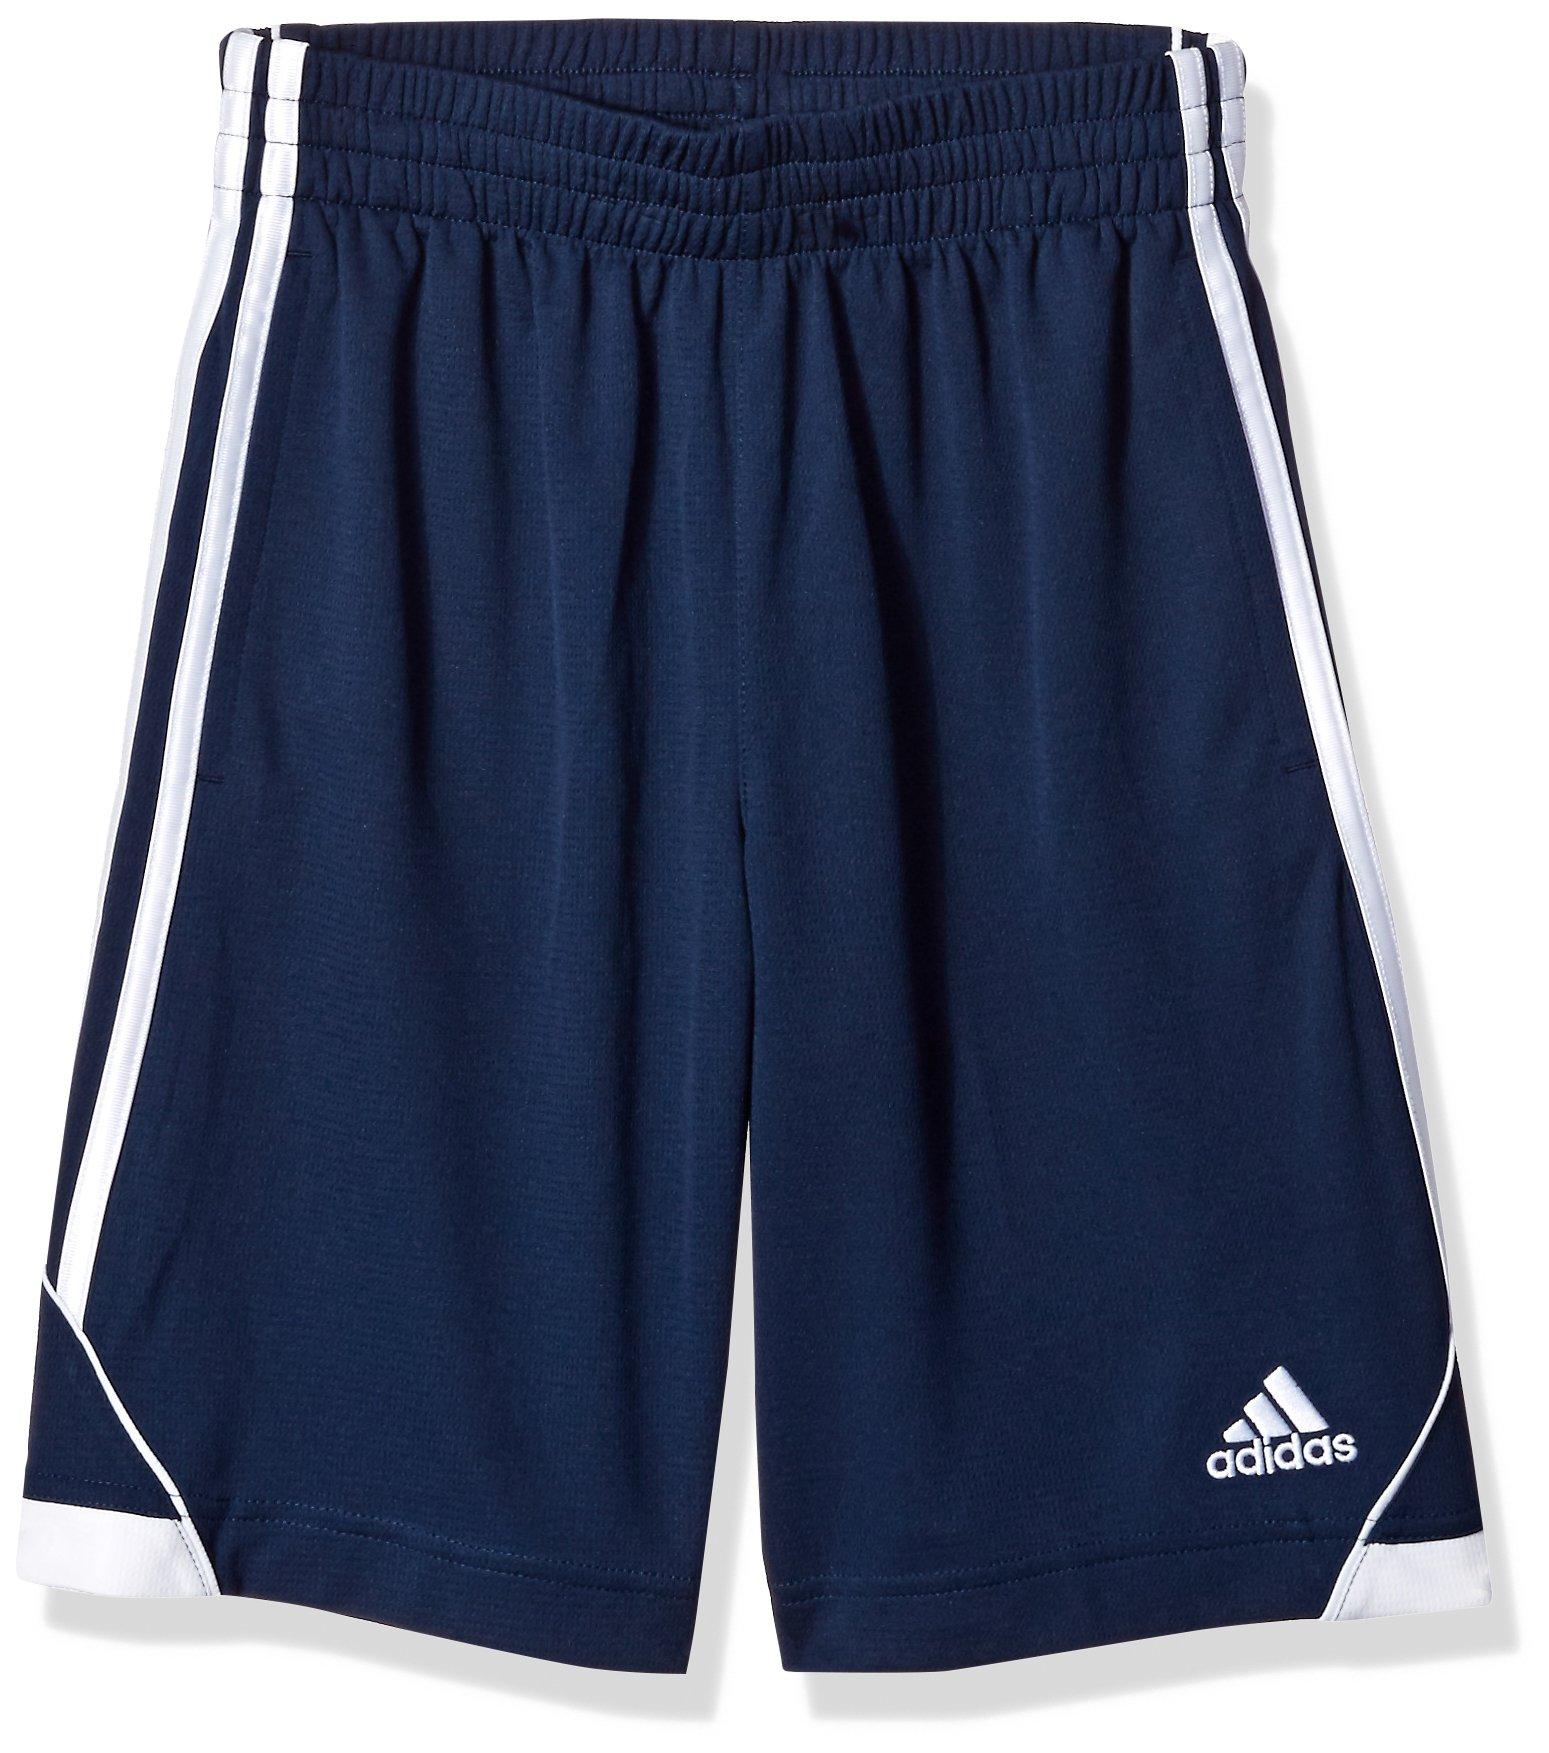 adidas Big Boys' Athletic Short, Navy, M